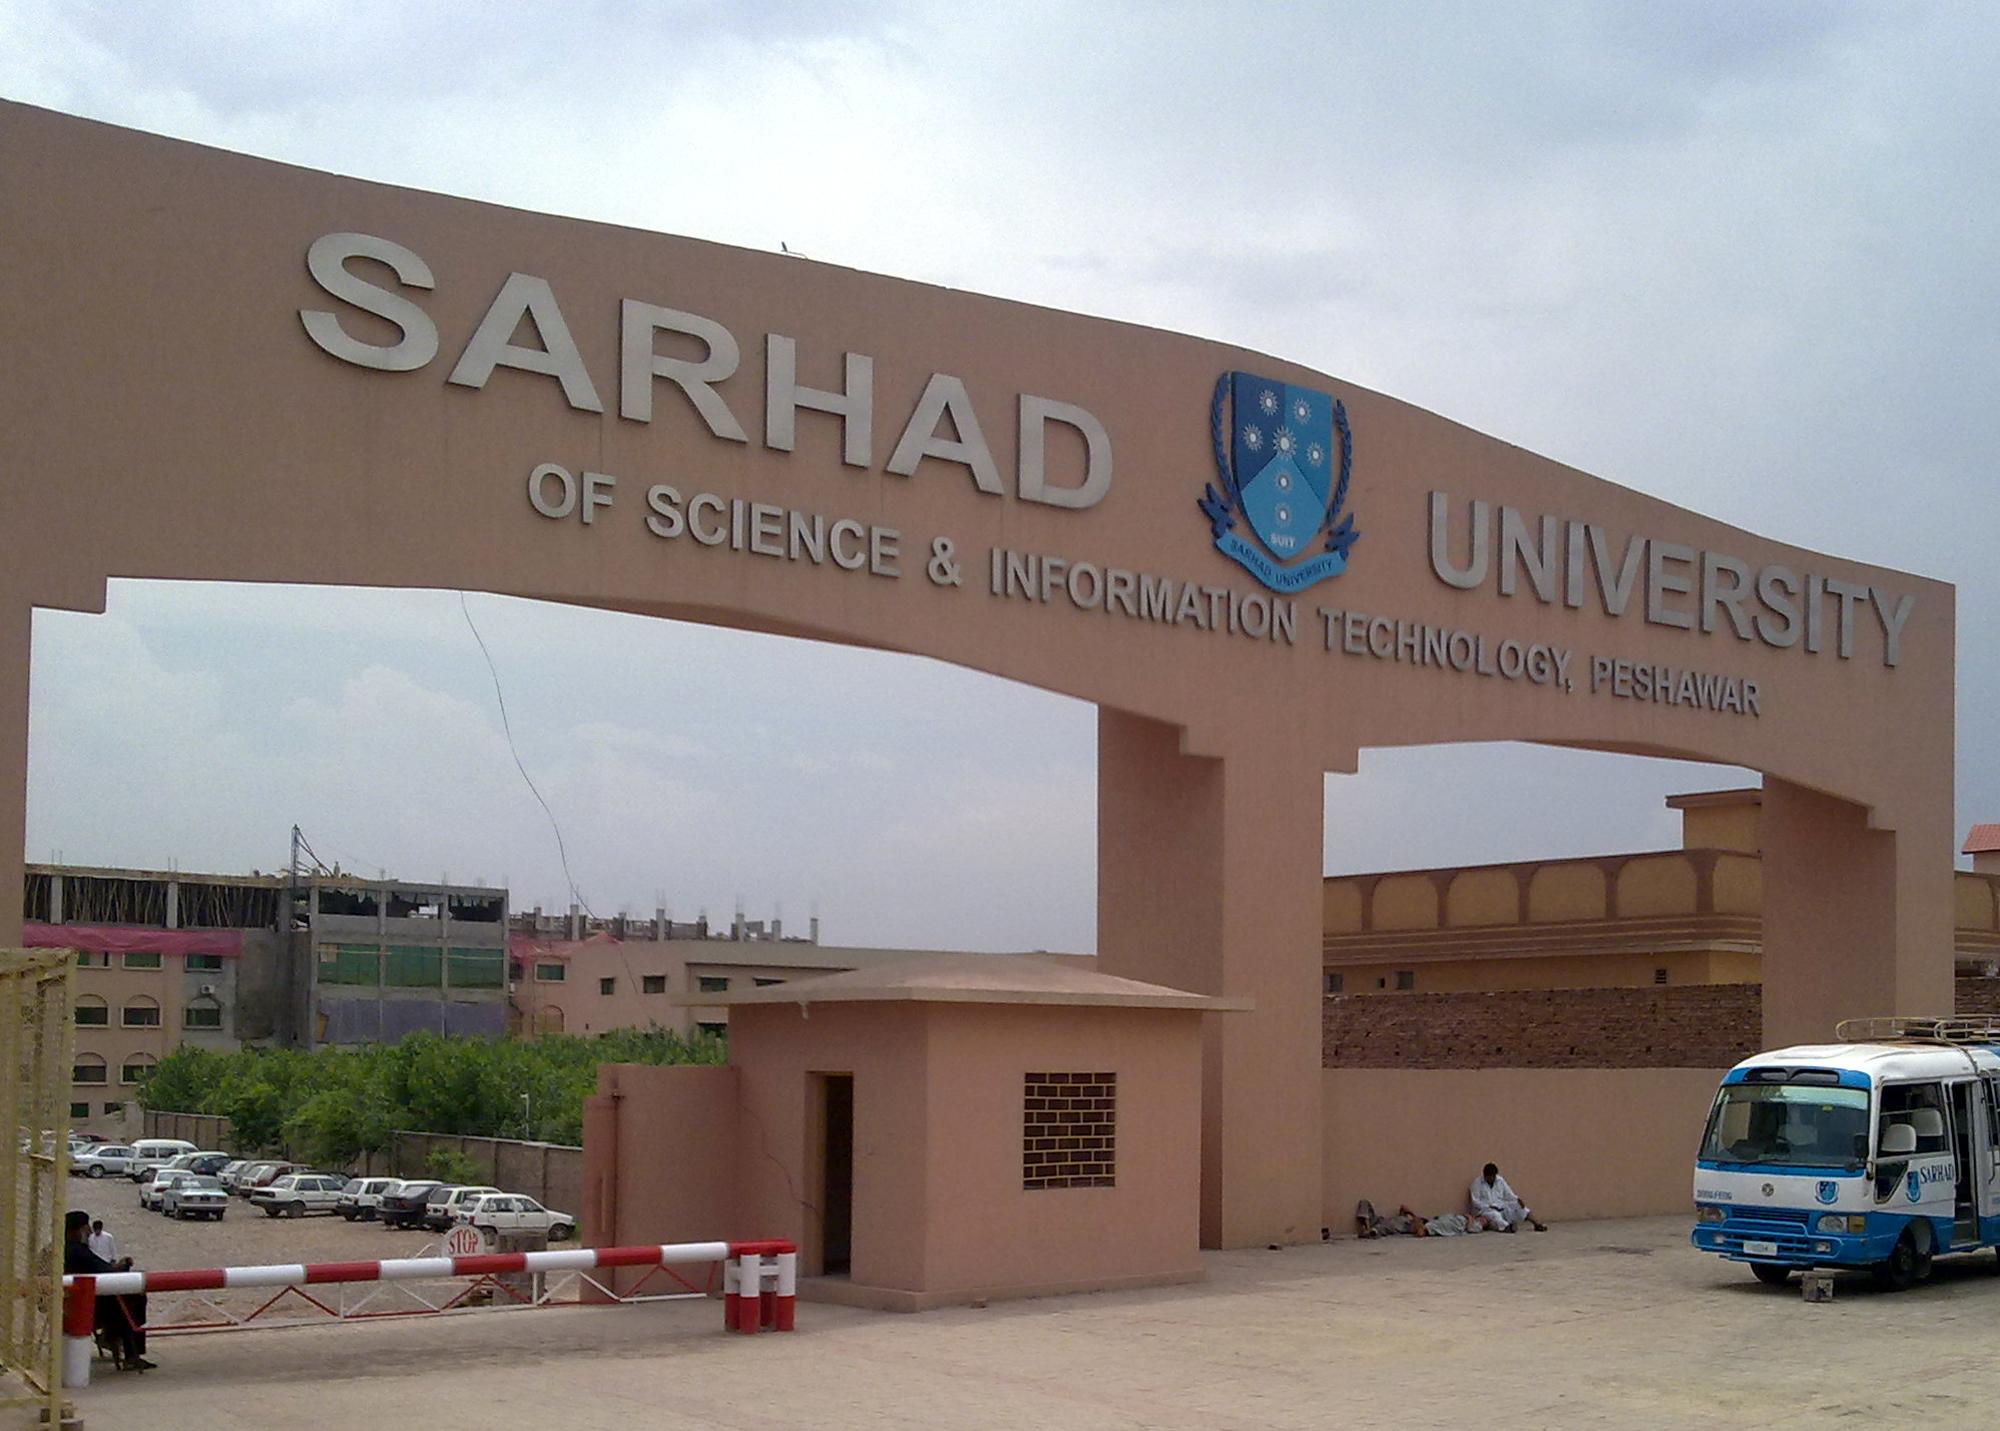 Sarhad University Peshawar Admission 2019 Last Date Eligibility, Form